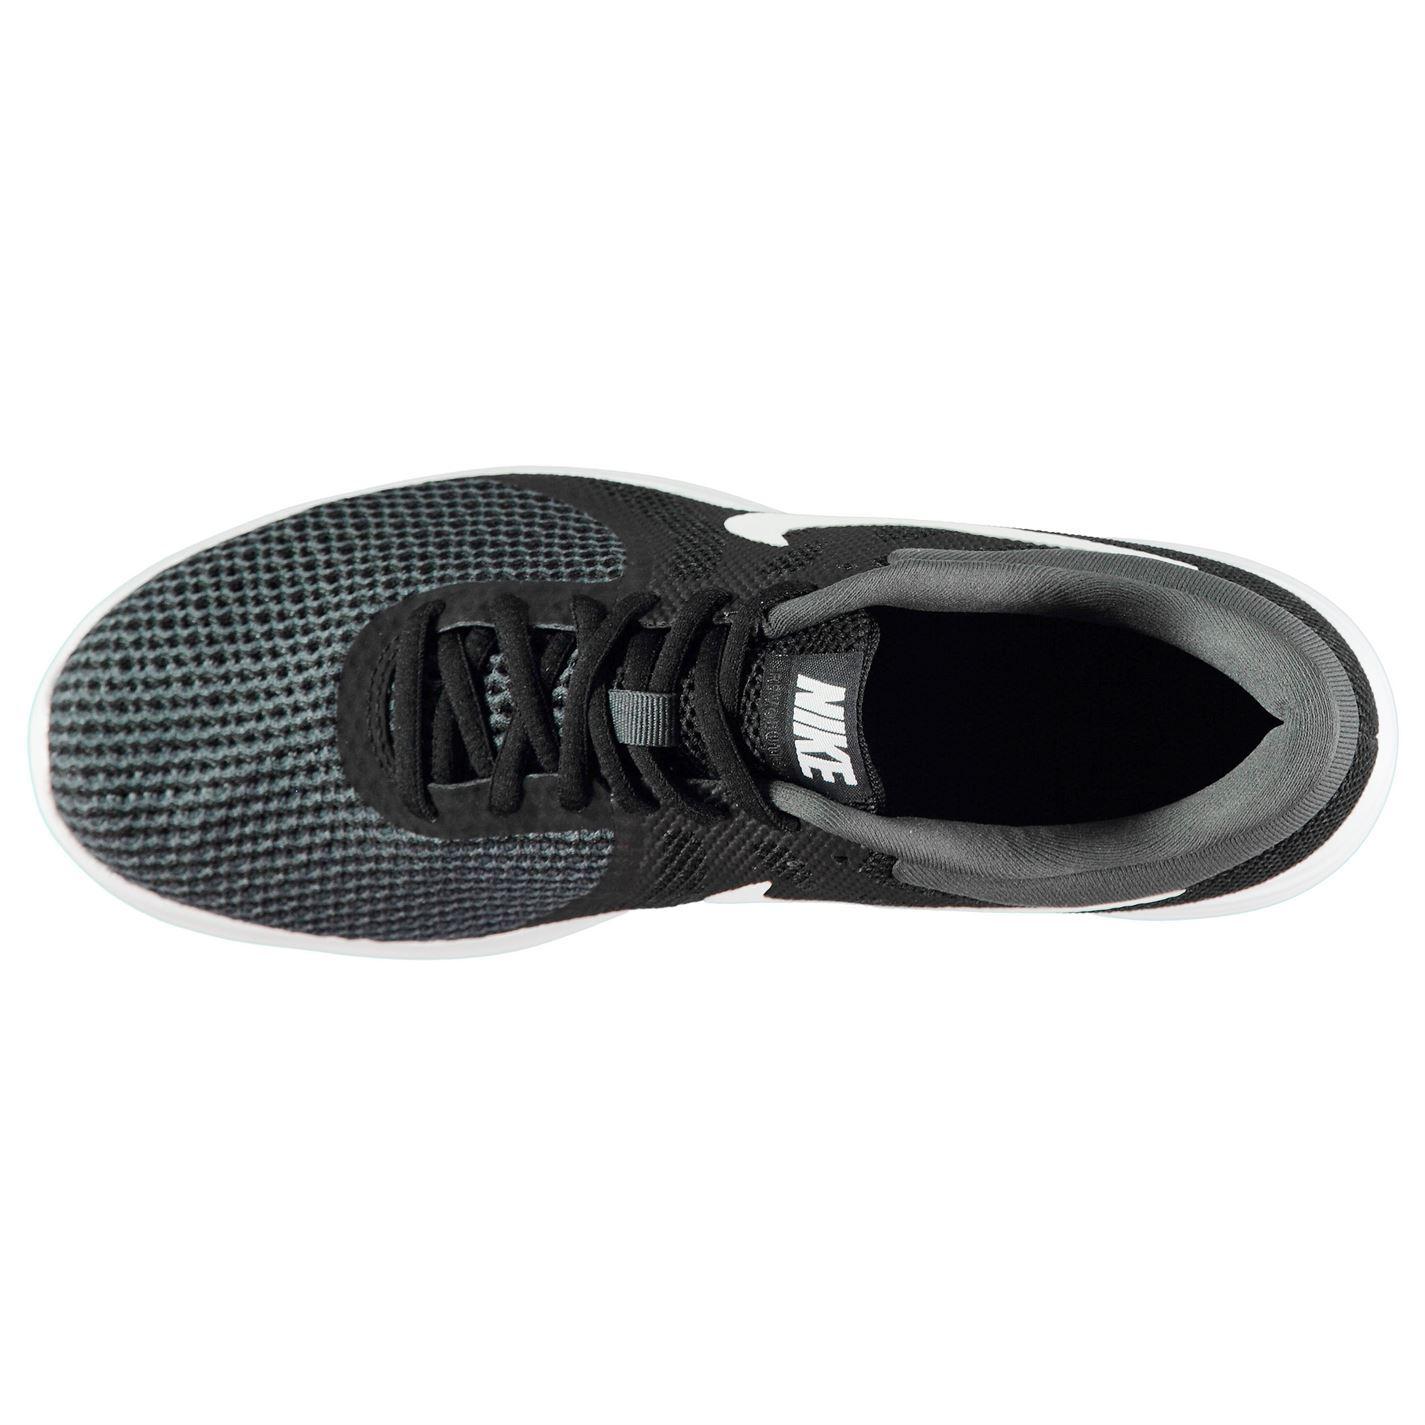 new product 96752 4b733 ... Sport baskets chaussures de Nike Revolution 4 formateurs Mens  Black White